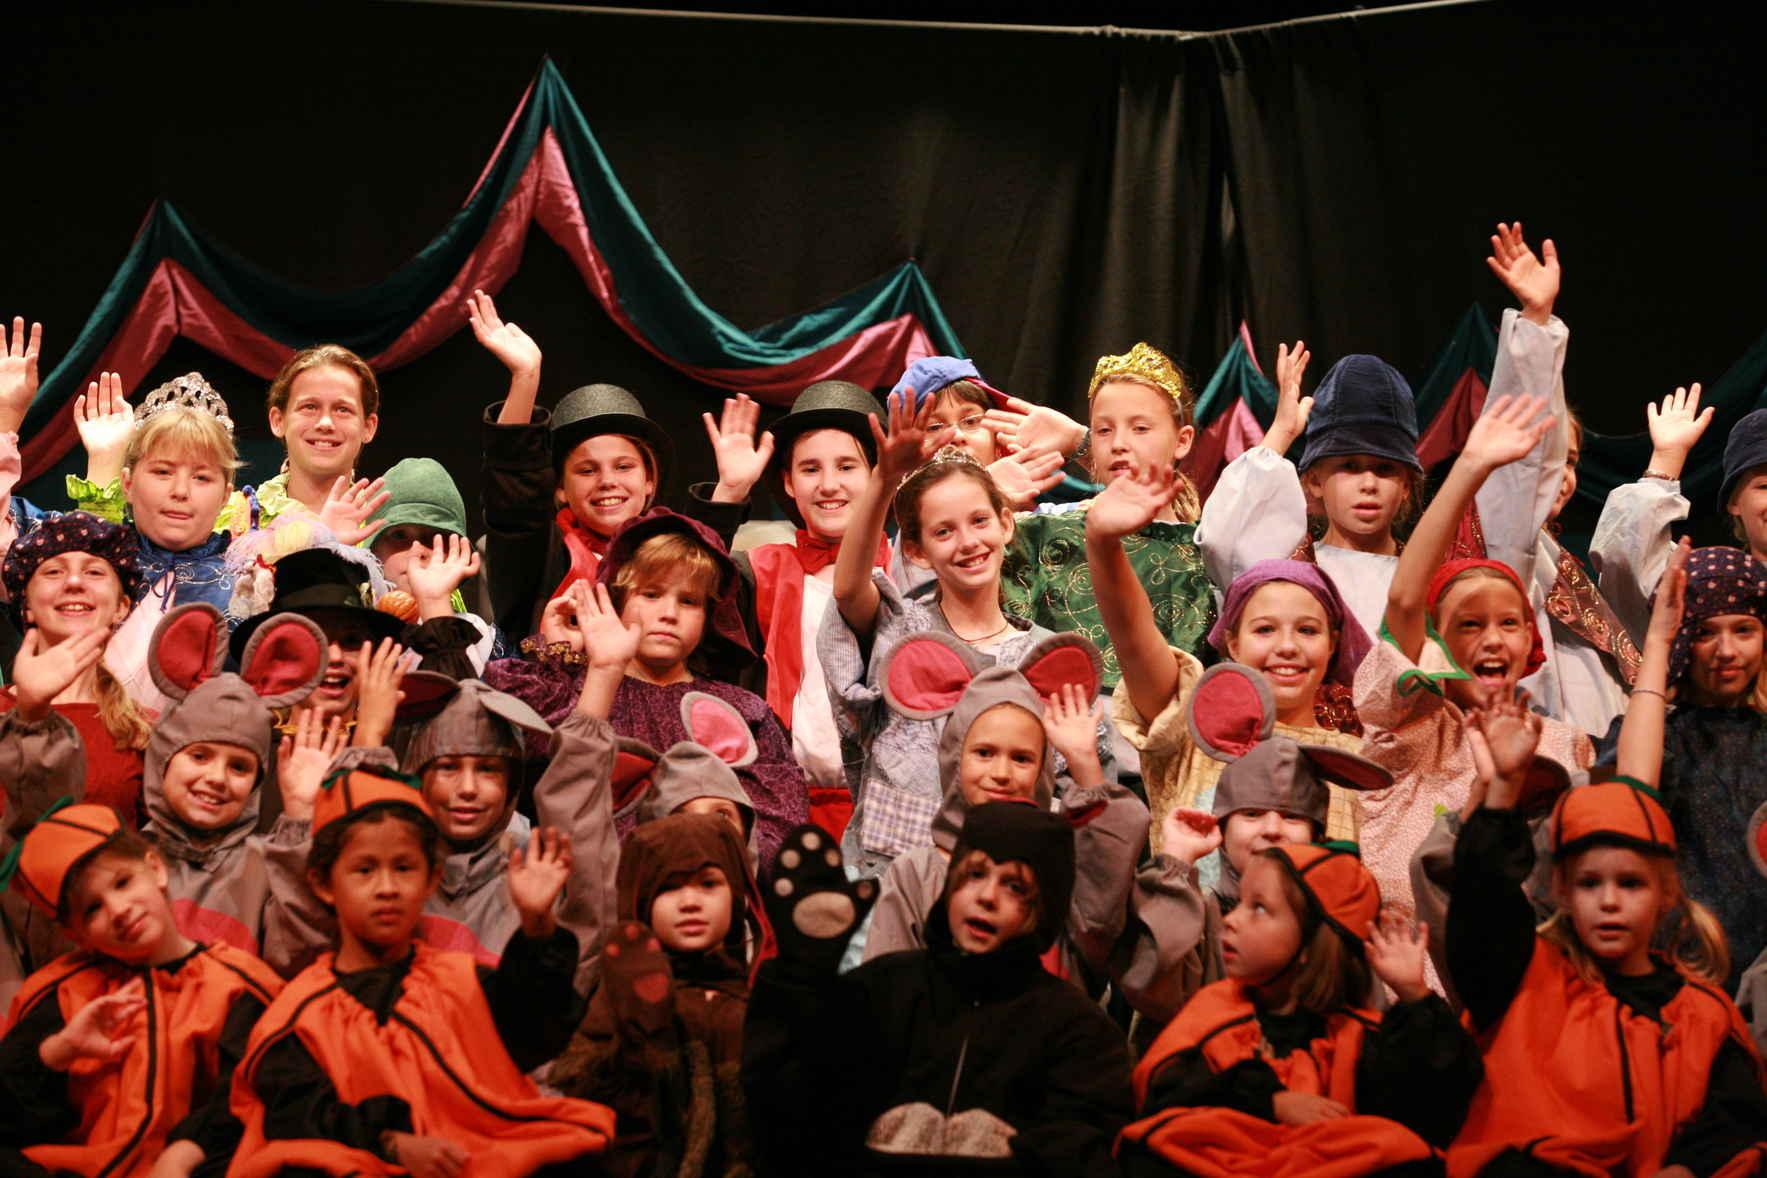 Missoula Children's Theatre's Cinderella 4:00 image